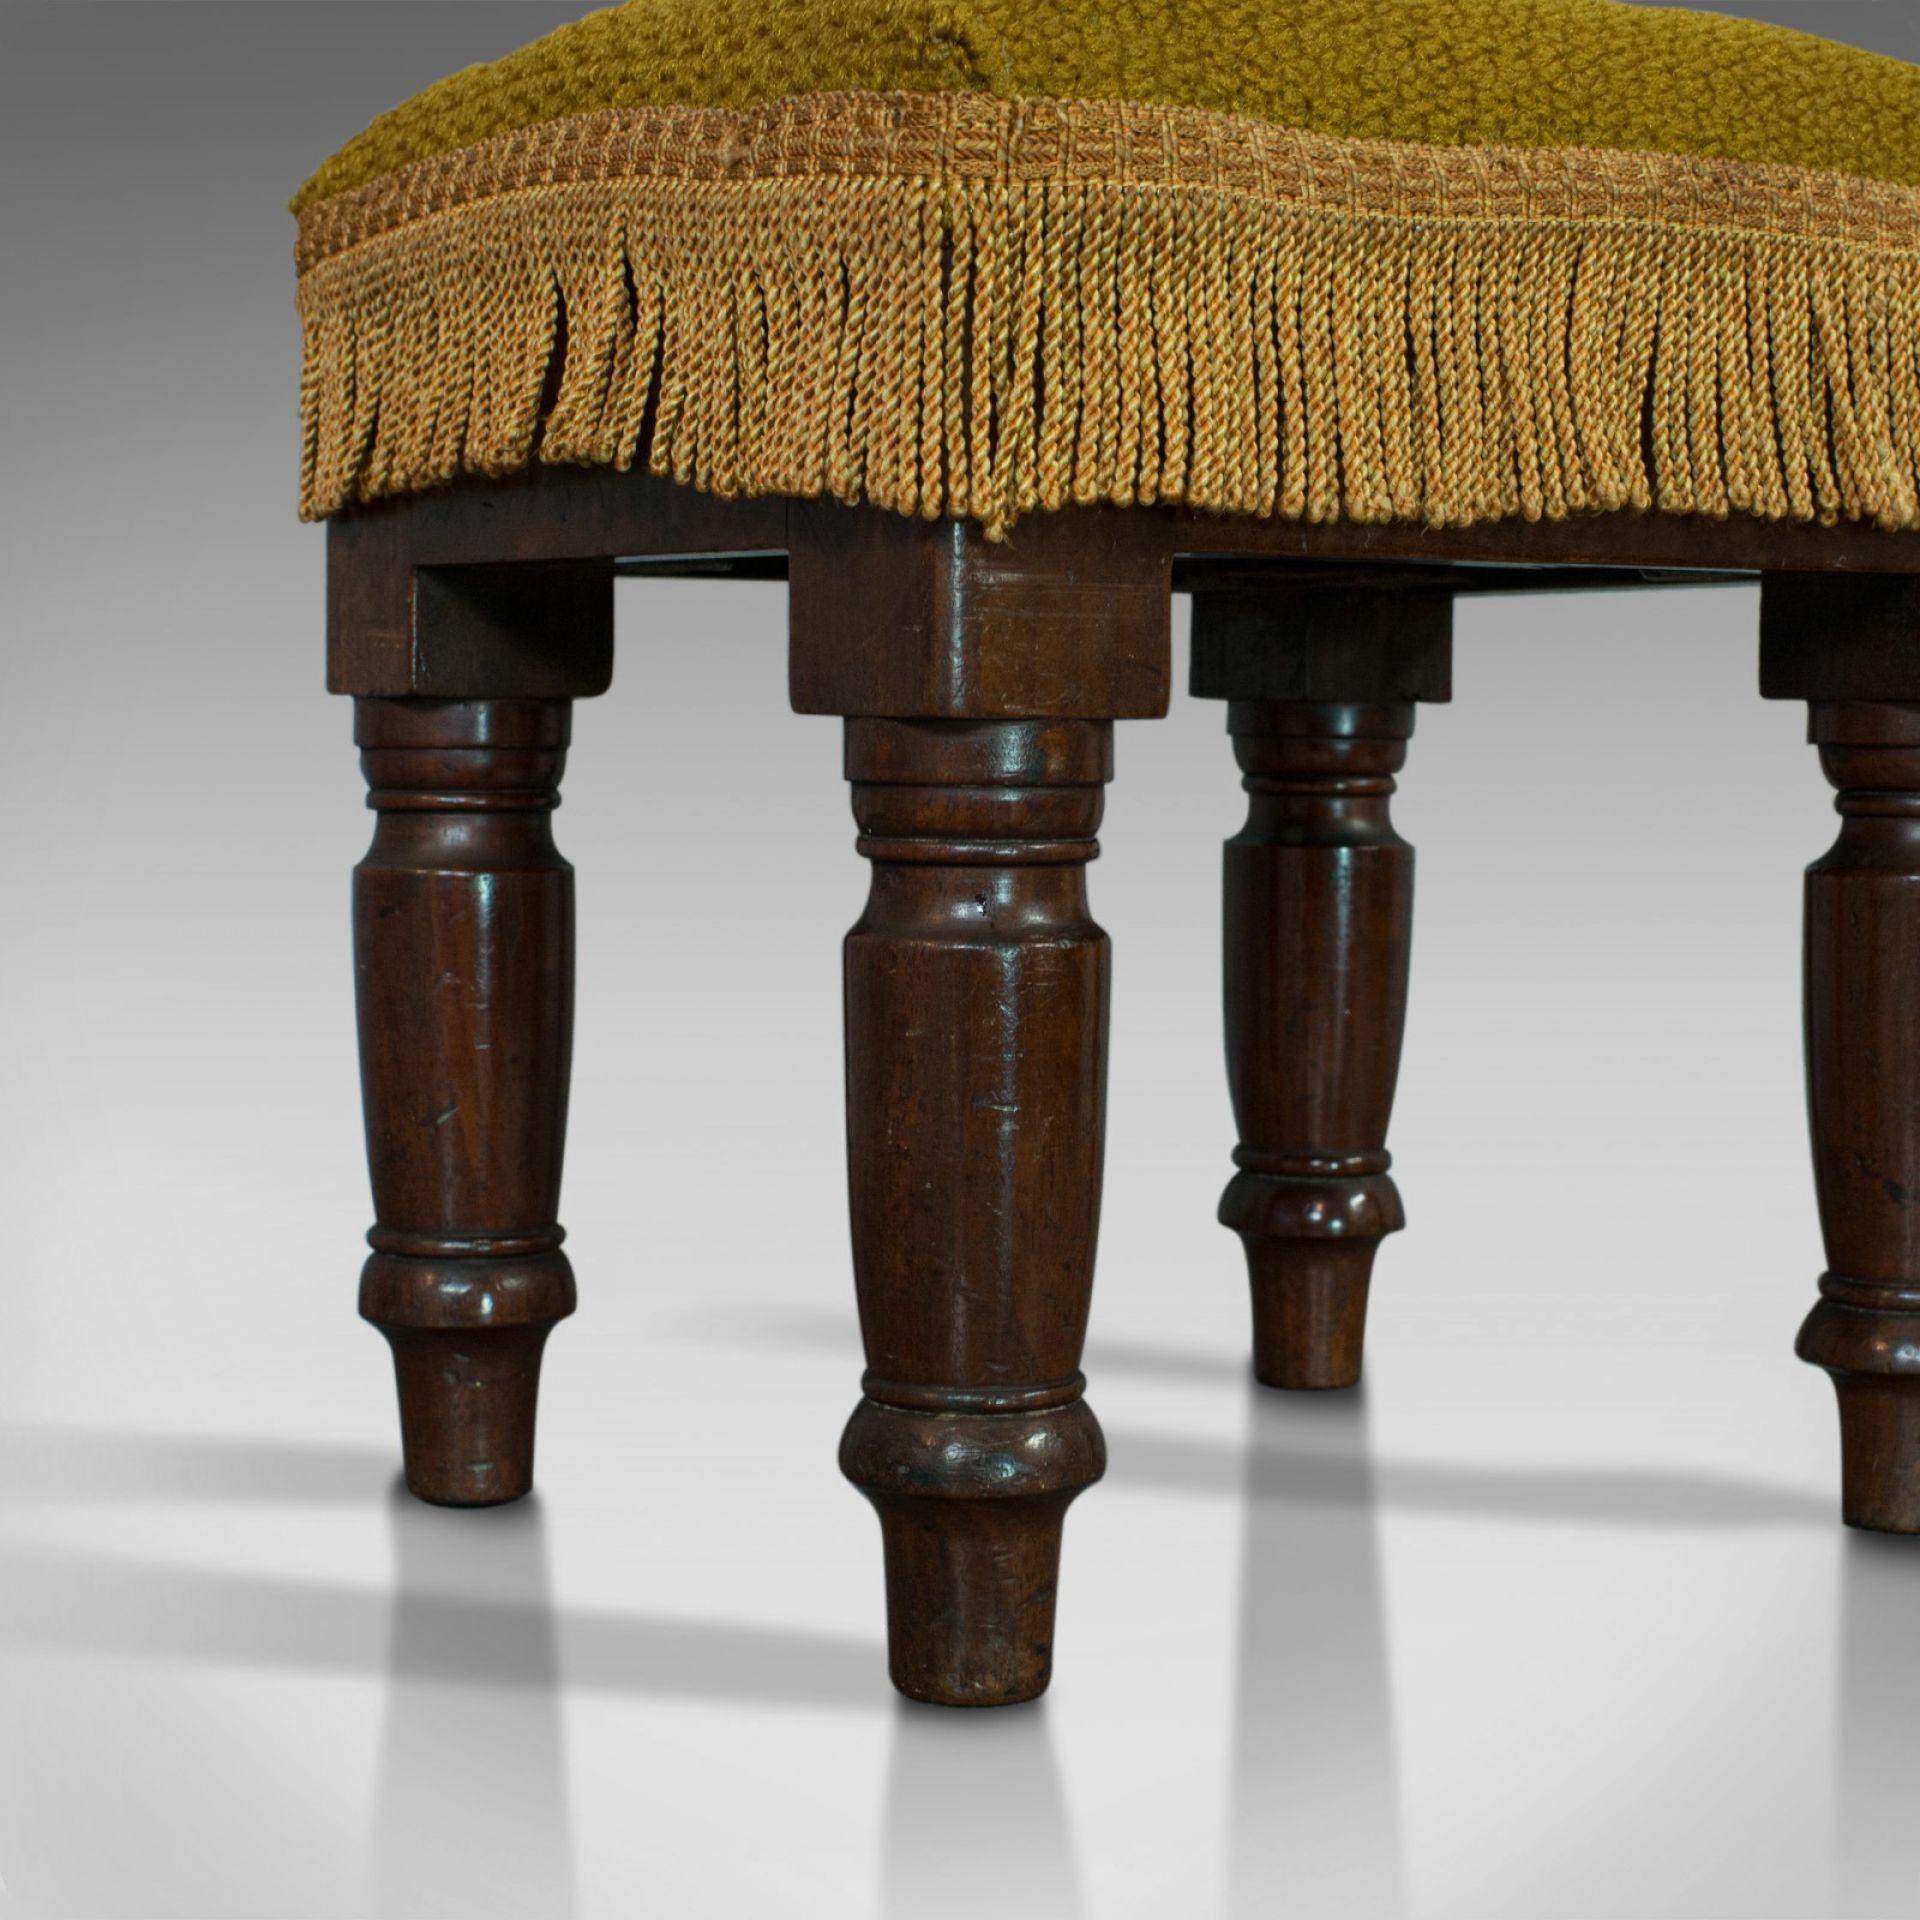 Antique Footstool, English, Mahogany, Stool, Upholstered, Victorian, Circa 1880